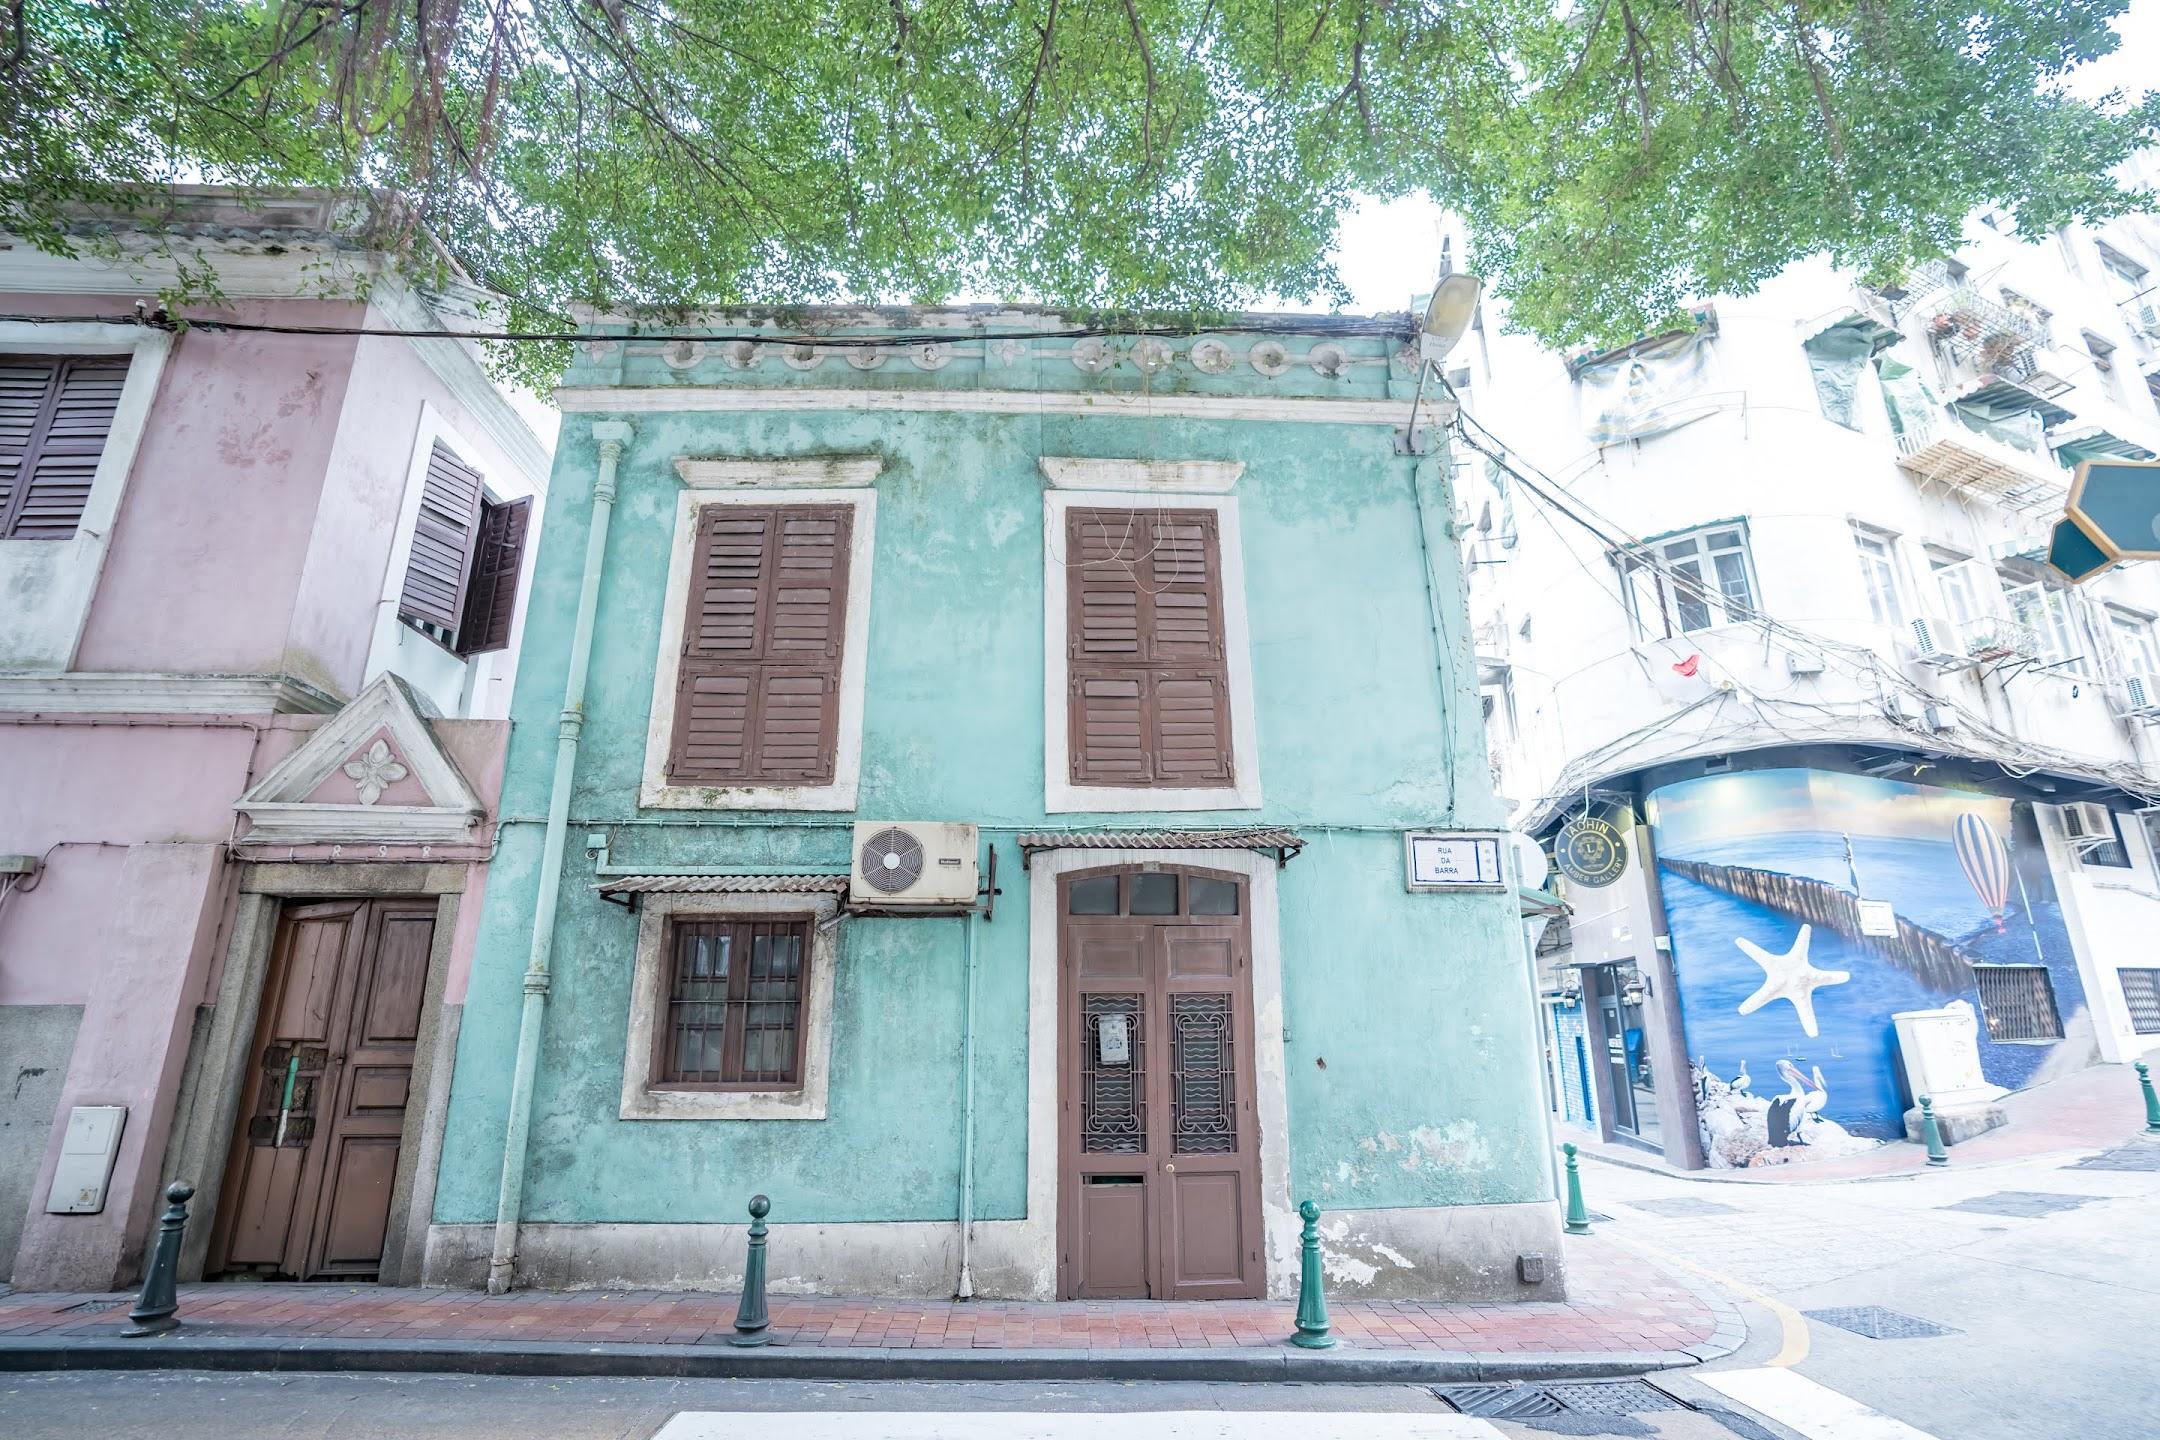 Macau Mandarin's House/鄭家大屋/Casa do Mandarim